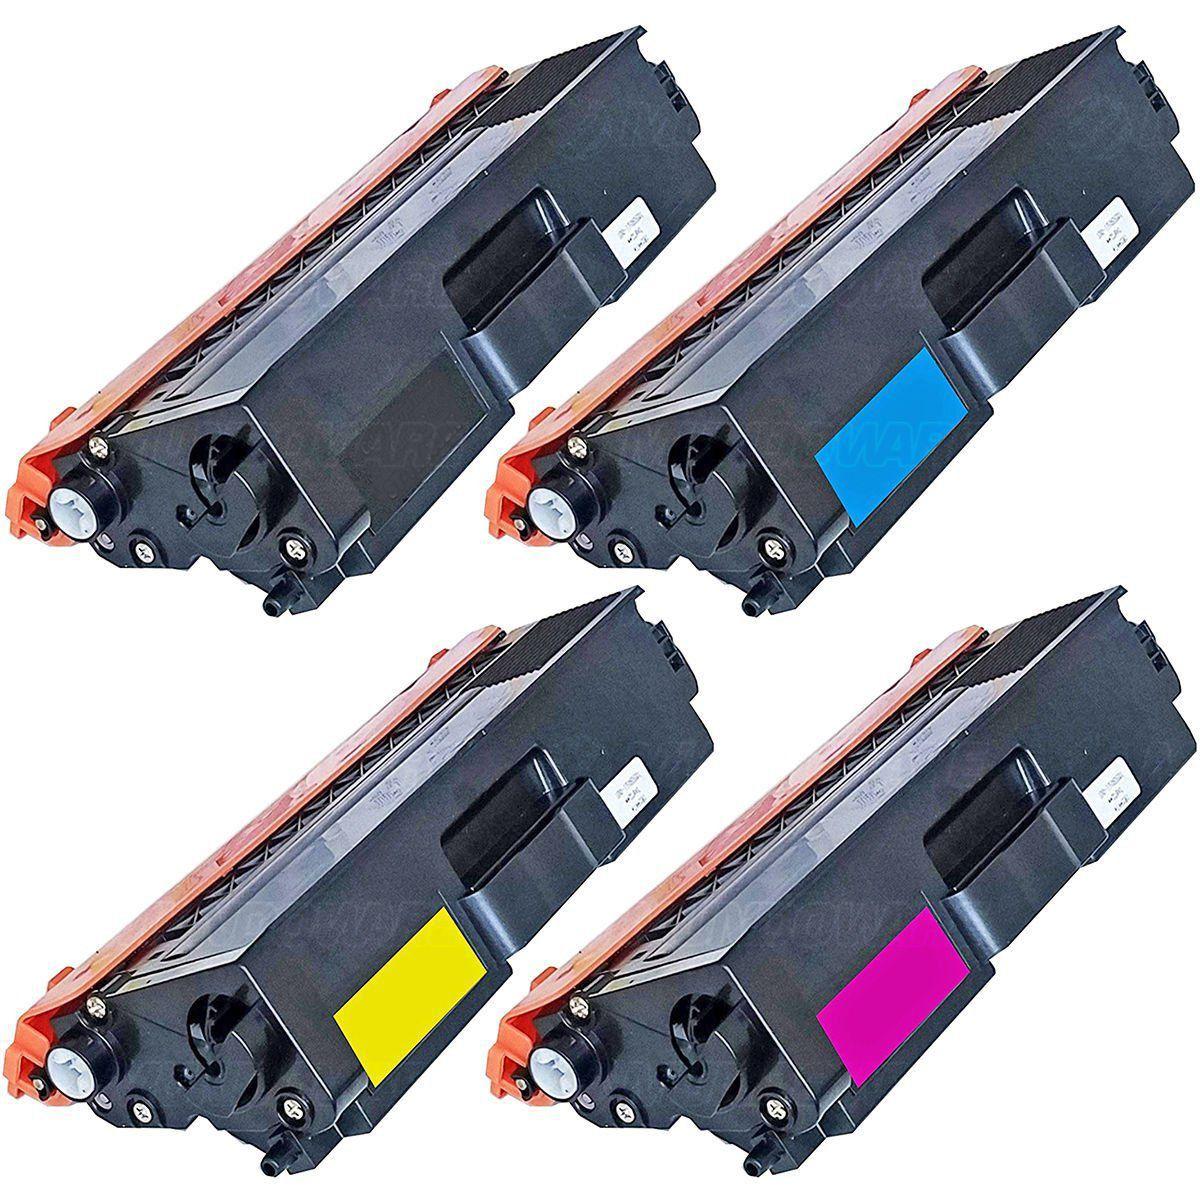 Compatível: Kit Colorido de Toner TN419 para Brother HL-L8360cdw MFC-L8610cdw L8900cdw L9570cdw L8360 L8610 L8900 L9570